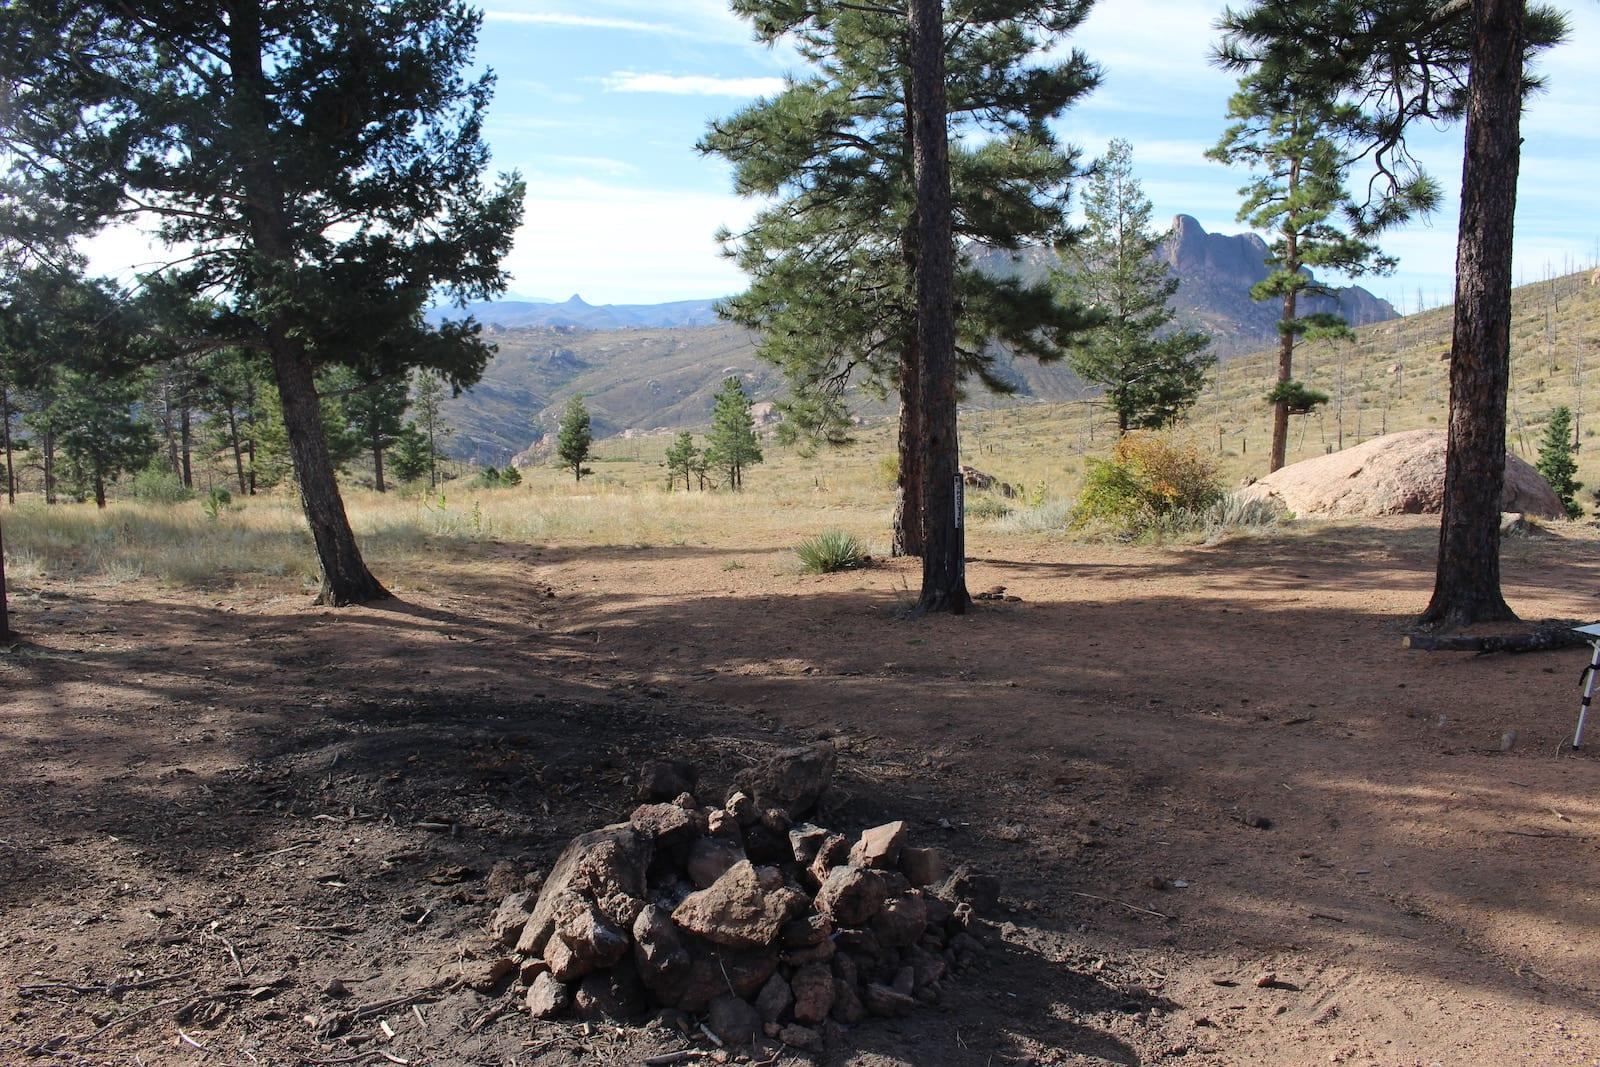 Camping Deckers CO near Cheesman Lake